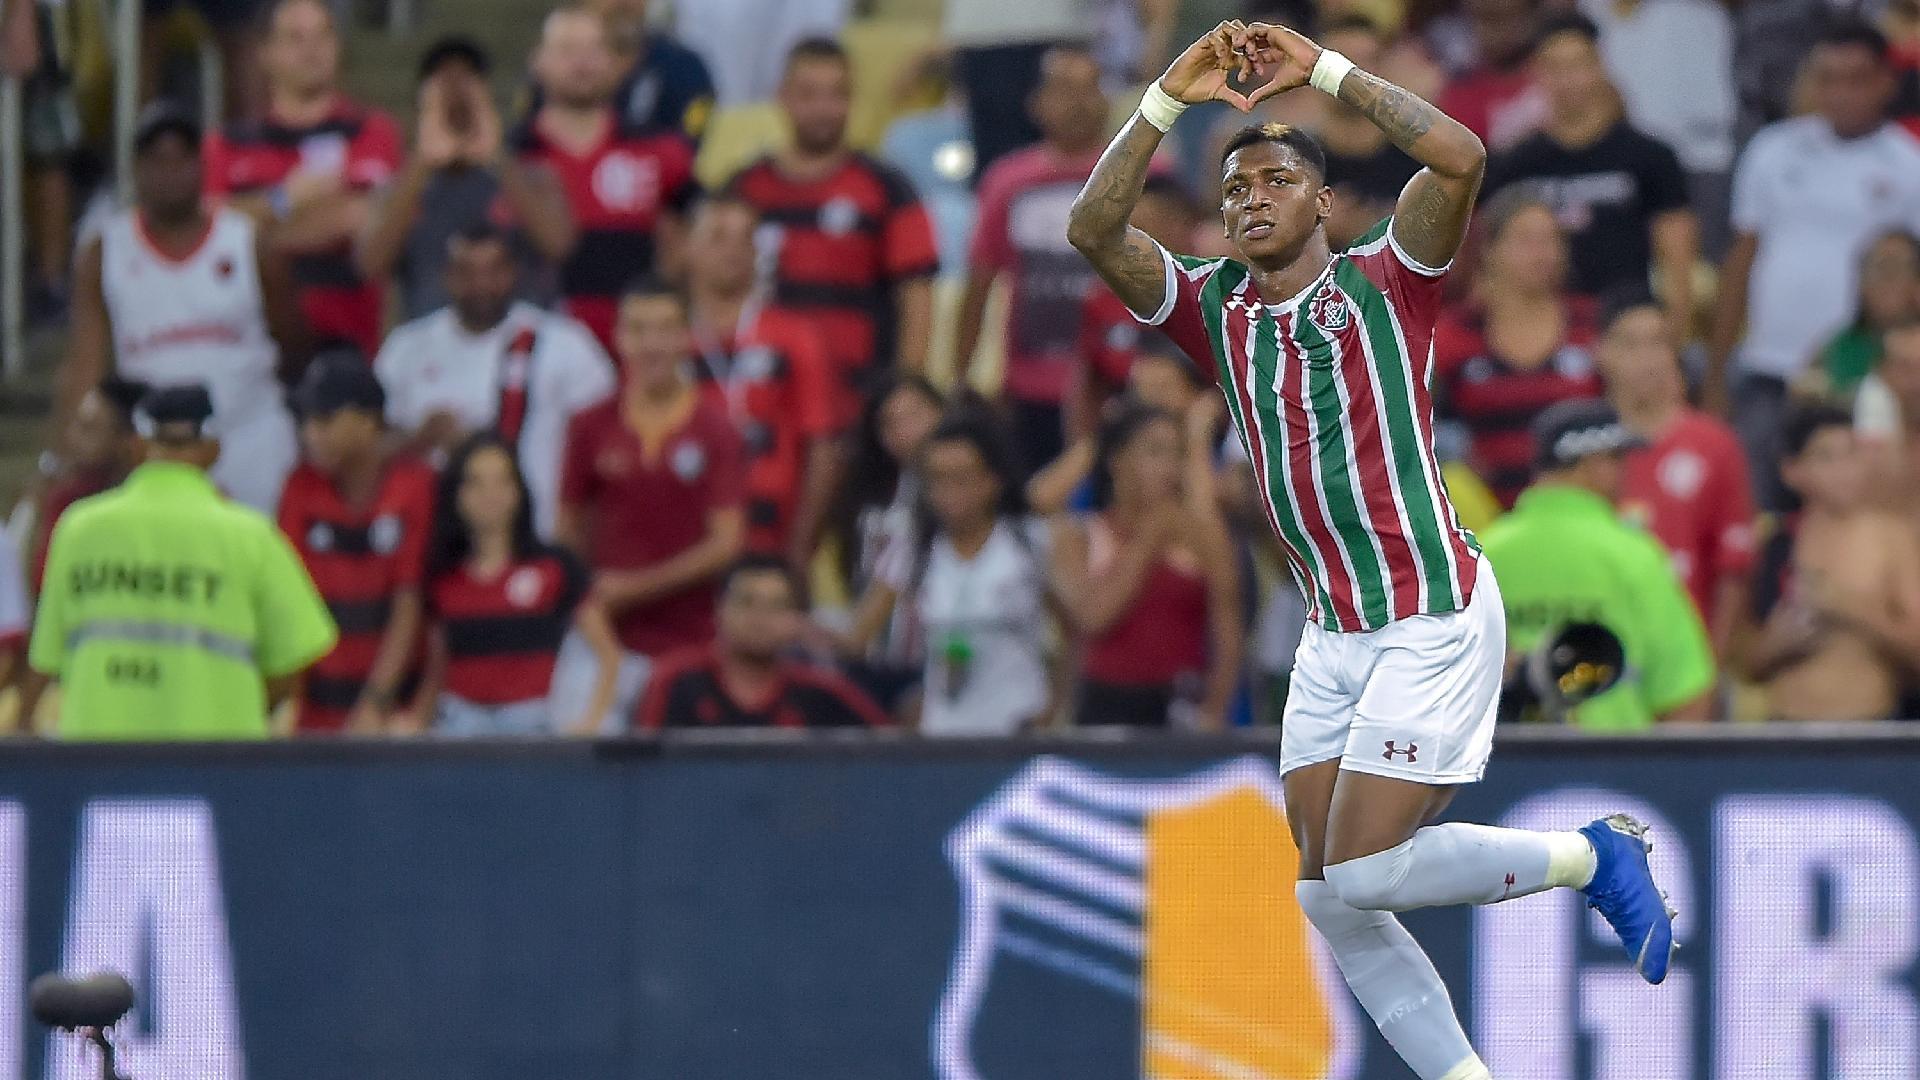 Yony Gonzalez comemora gol de pênalti para o Fluminense durante partida contra o Flamengo pelo Campeonato Carioca